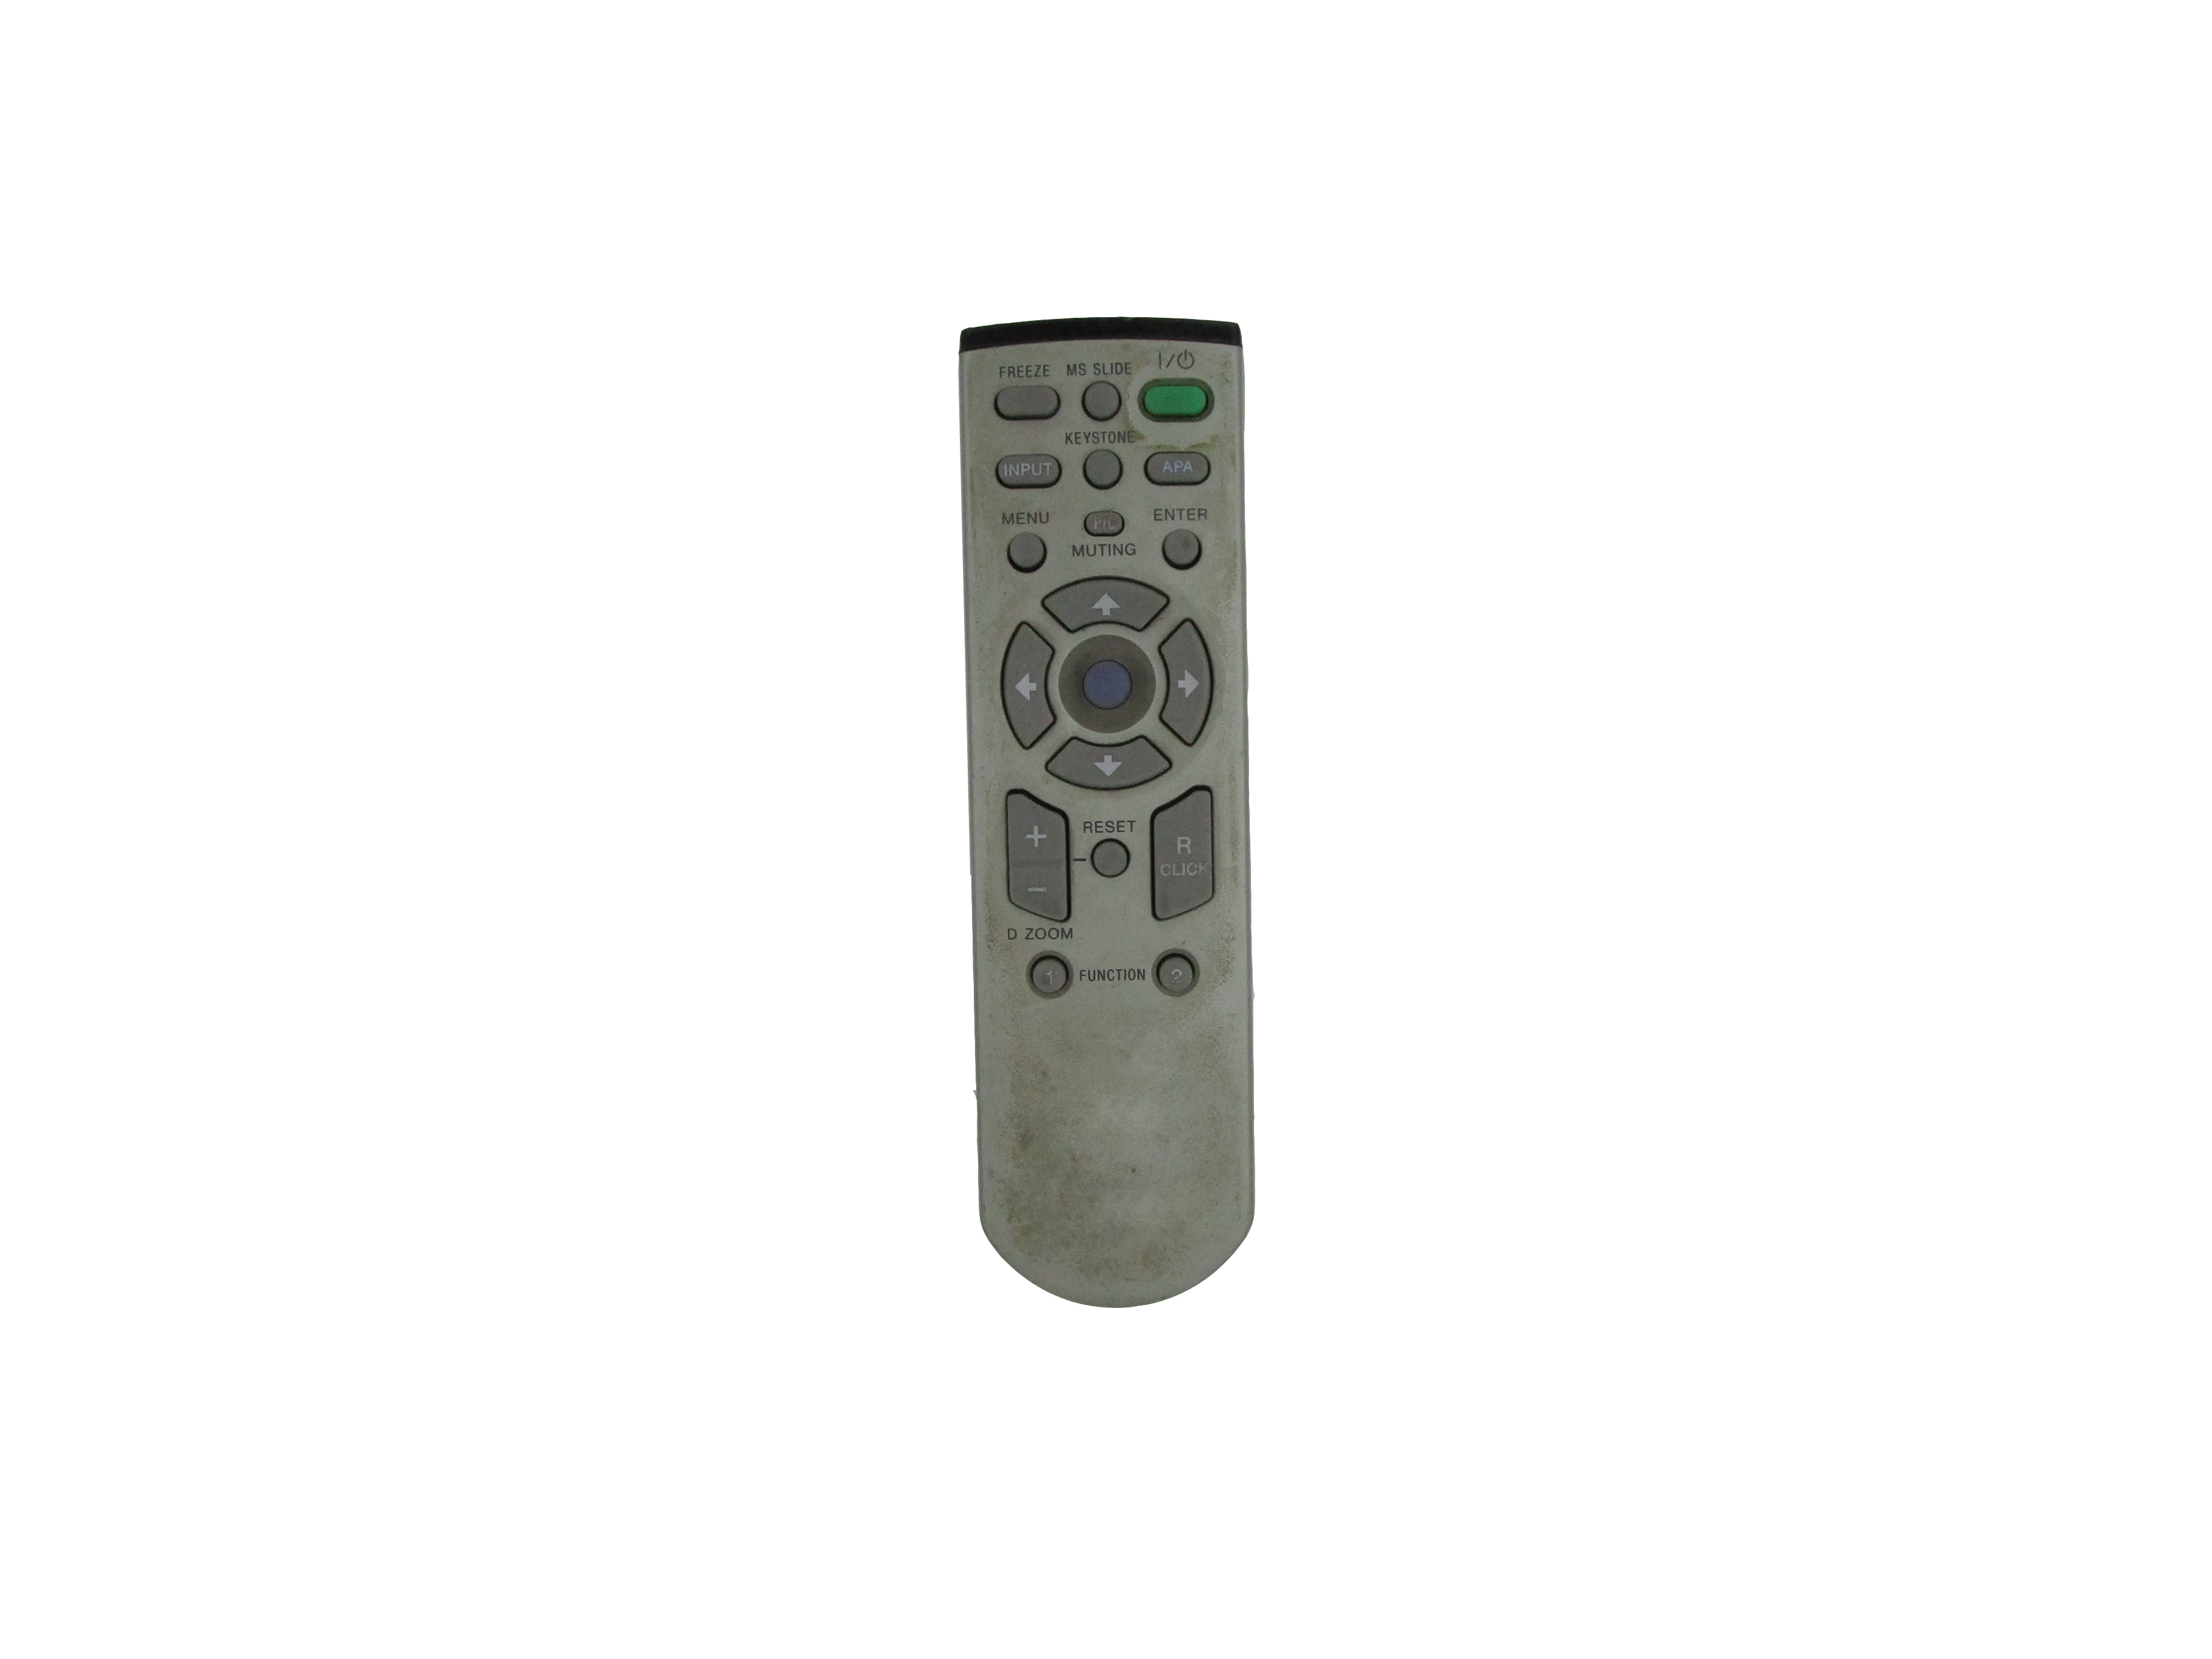 Control remoto para Sony VPL-CX11RM-PJM12 RM-PJM10 VPL-CX6 VPL-EX1 VPL-PS10 VPL-CX10 VPL-CS10 VPL-CS3...